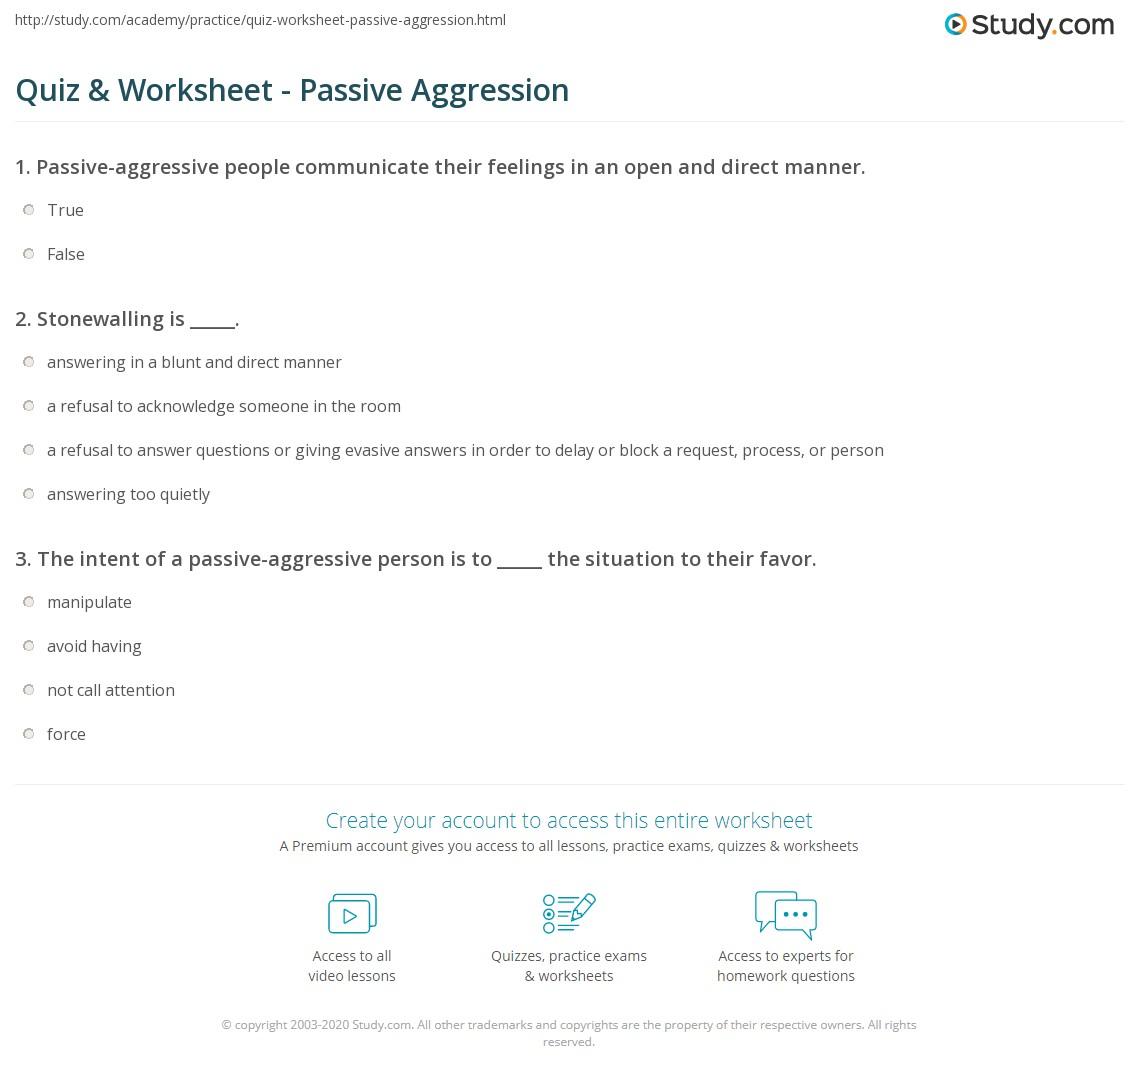 quiz & worksheet - passive aggression | study